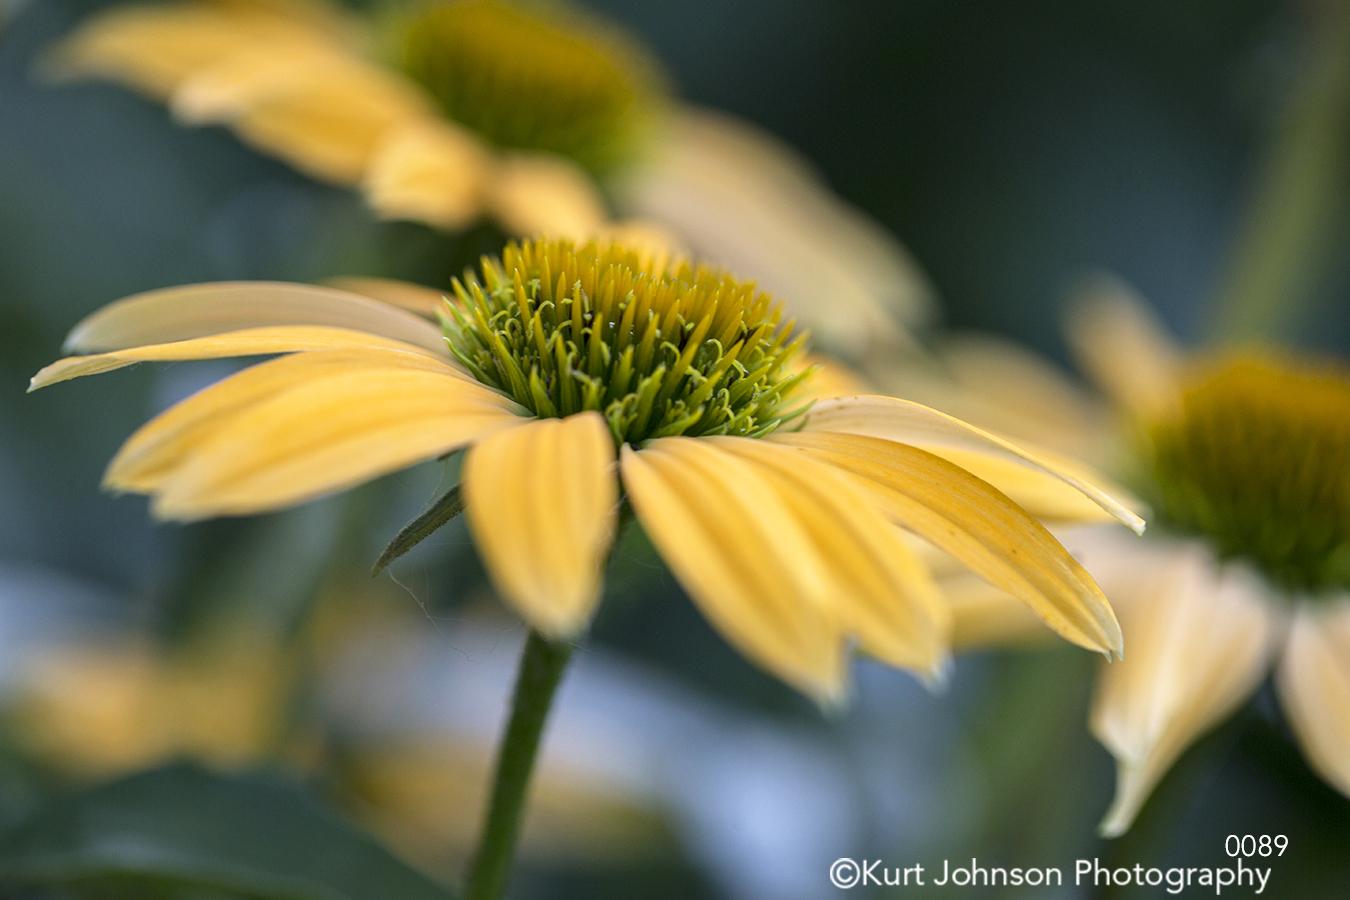 yellow flower stem flowers bloom close up detail macro field